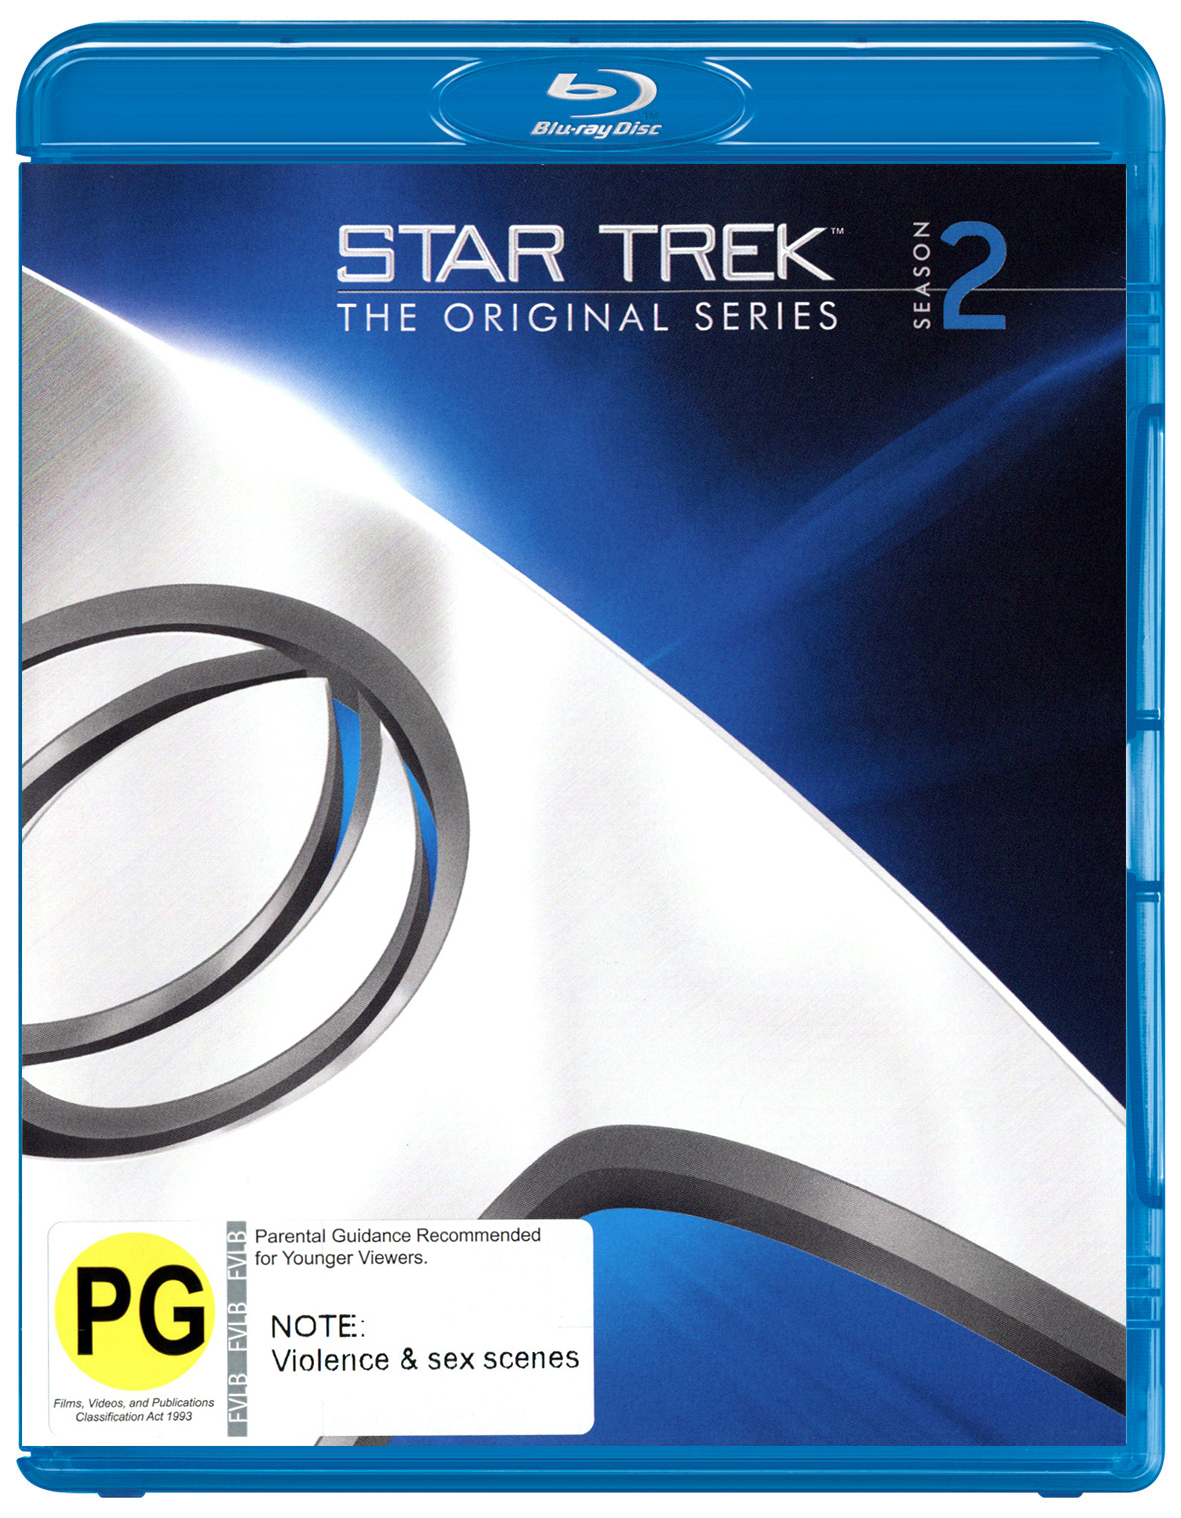 Star Trek The Original Series Season 2 image